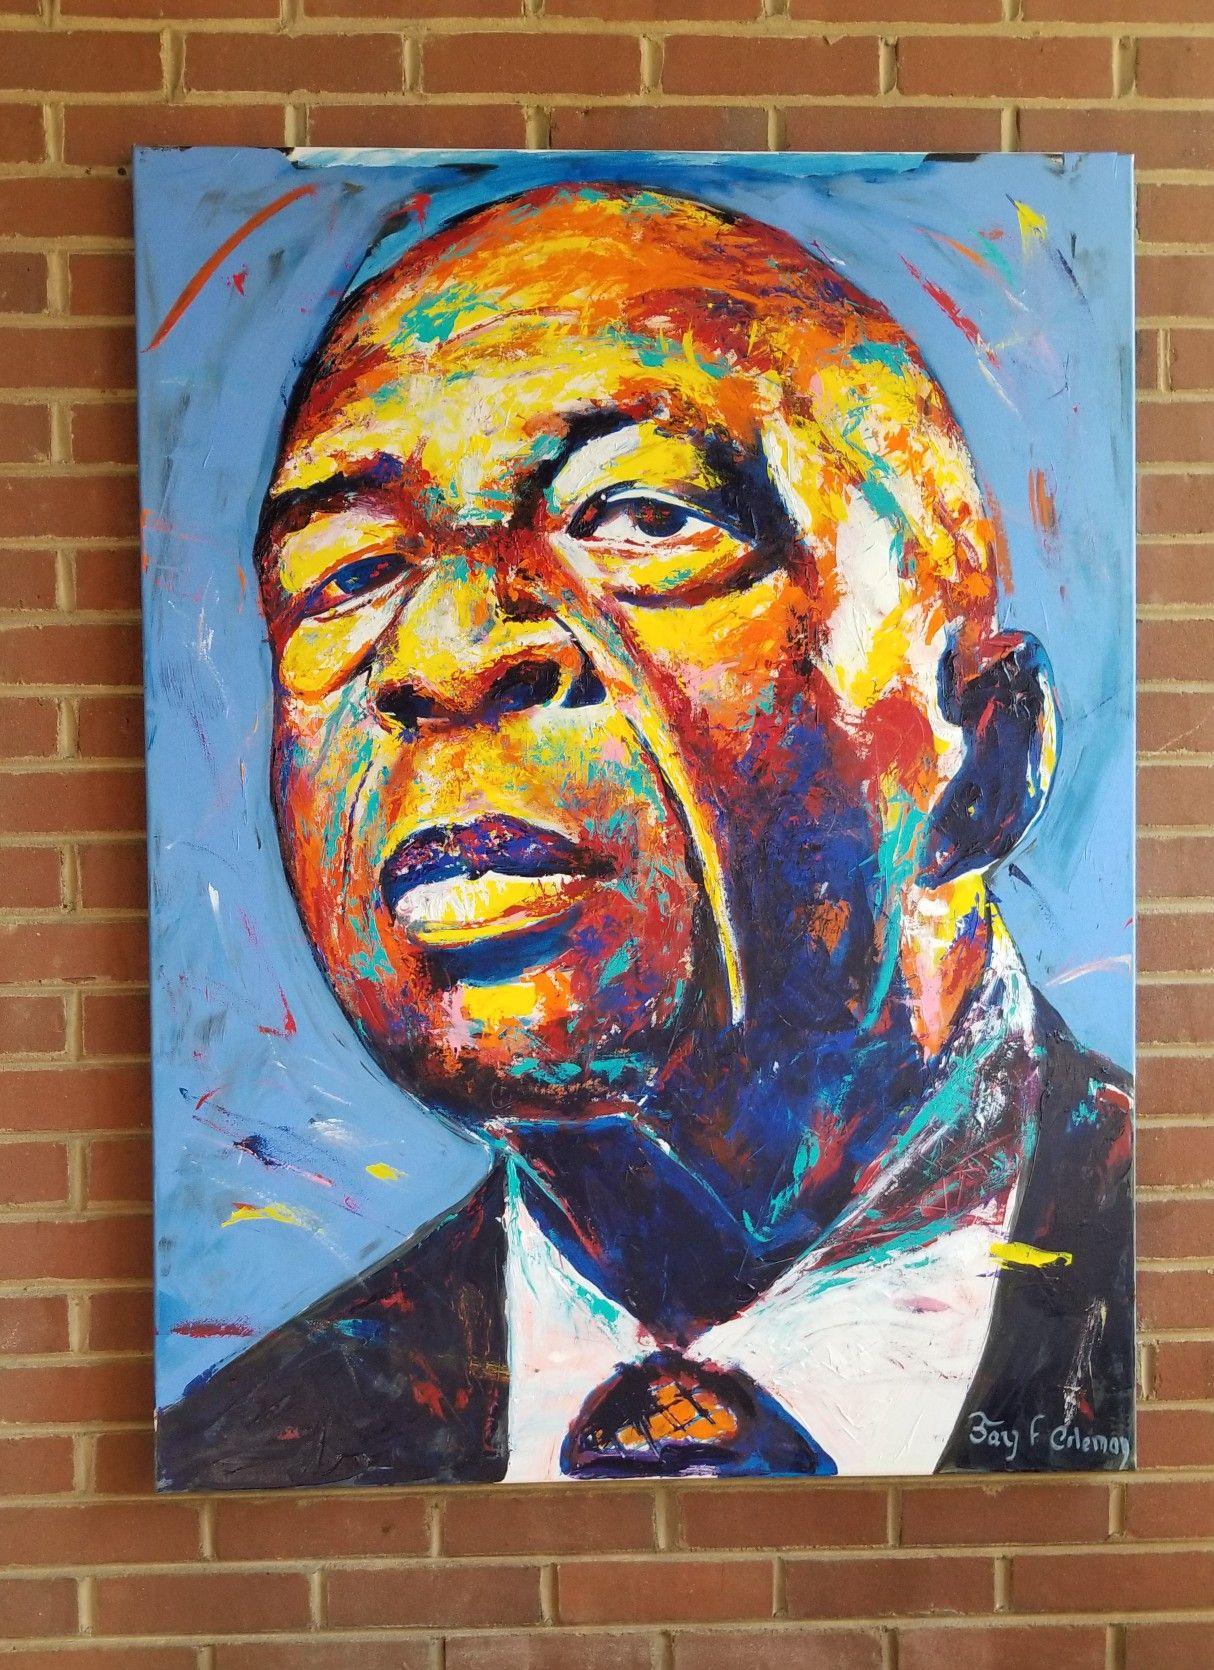 Elijah cummings portrait by jay coleman painted live at